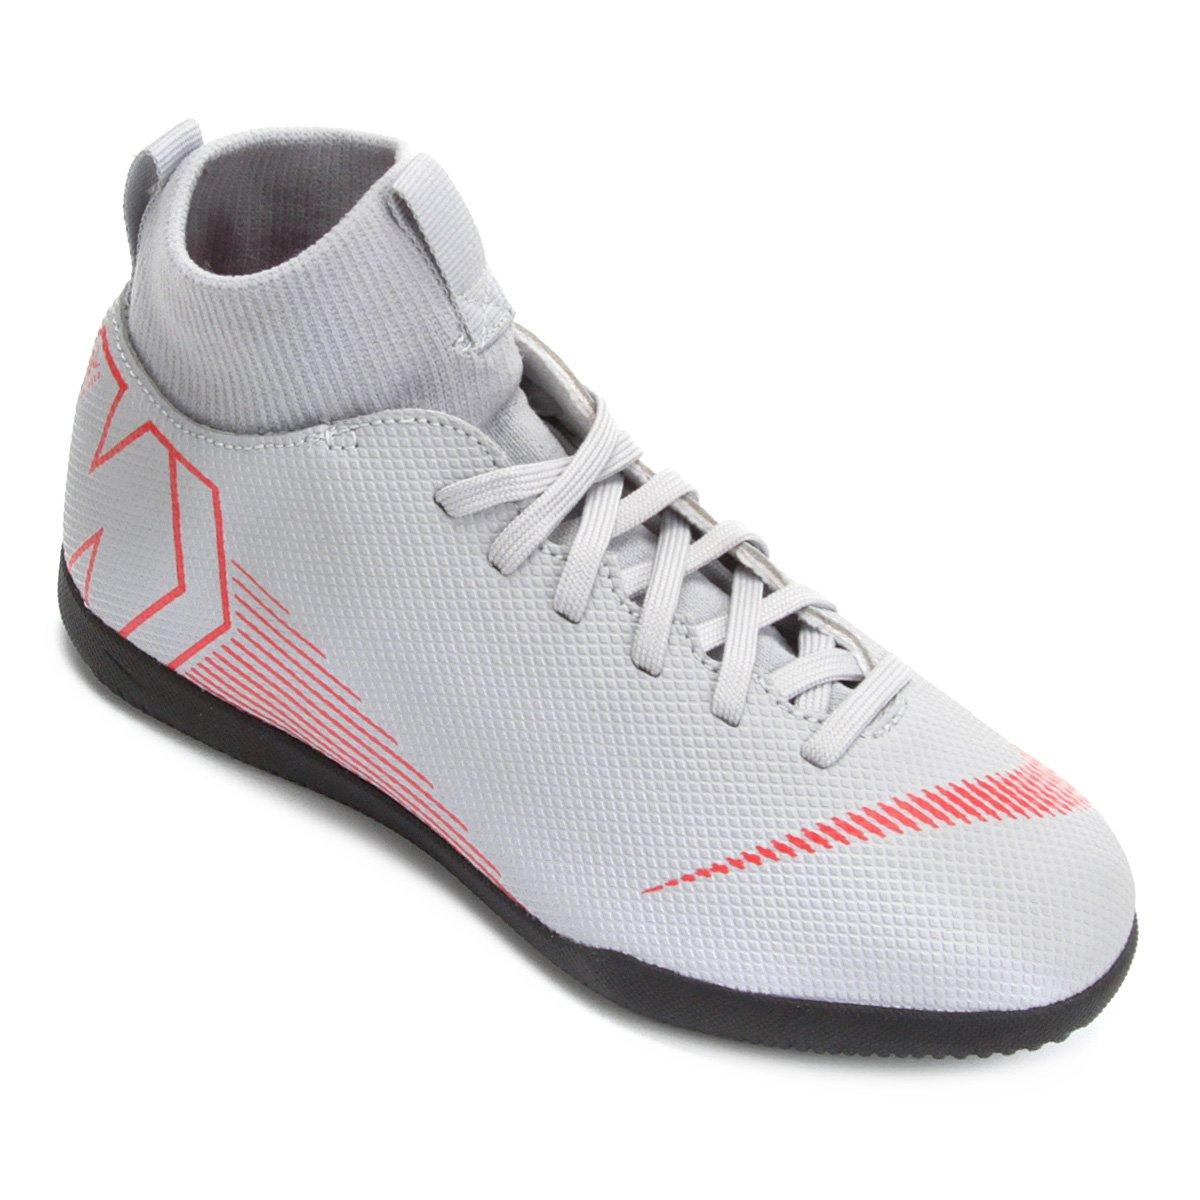 c697163df72 Chuteira Futsal Infantil Nike Mercurial Superfly 6 Club - Cinza e Preto - Compre  Agora